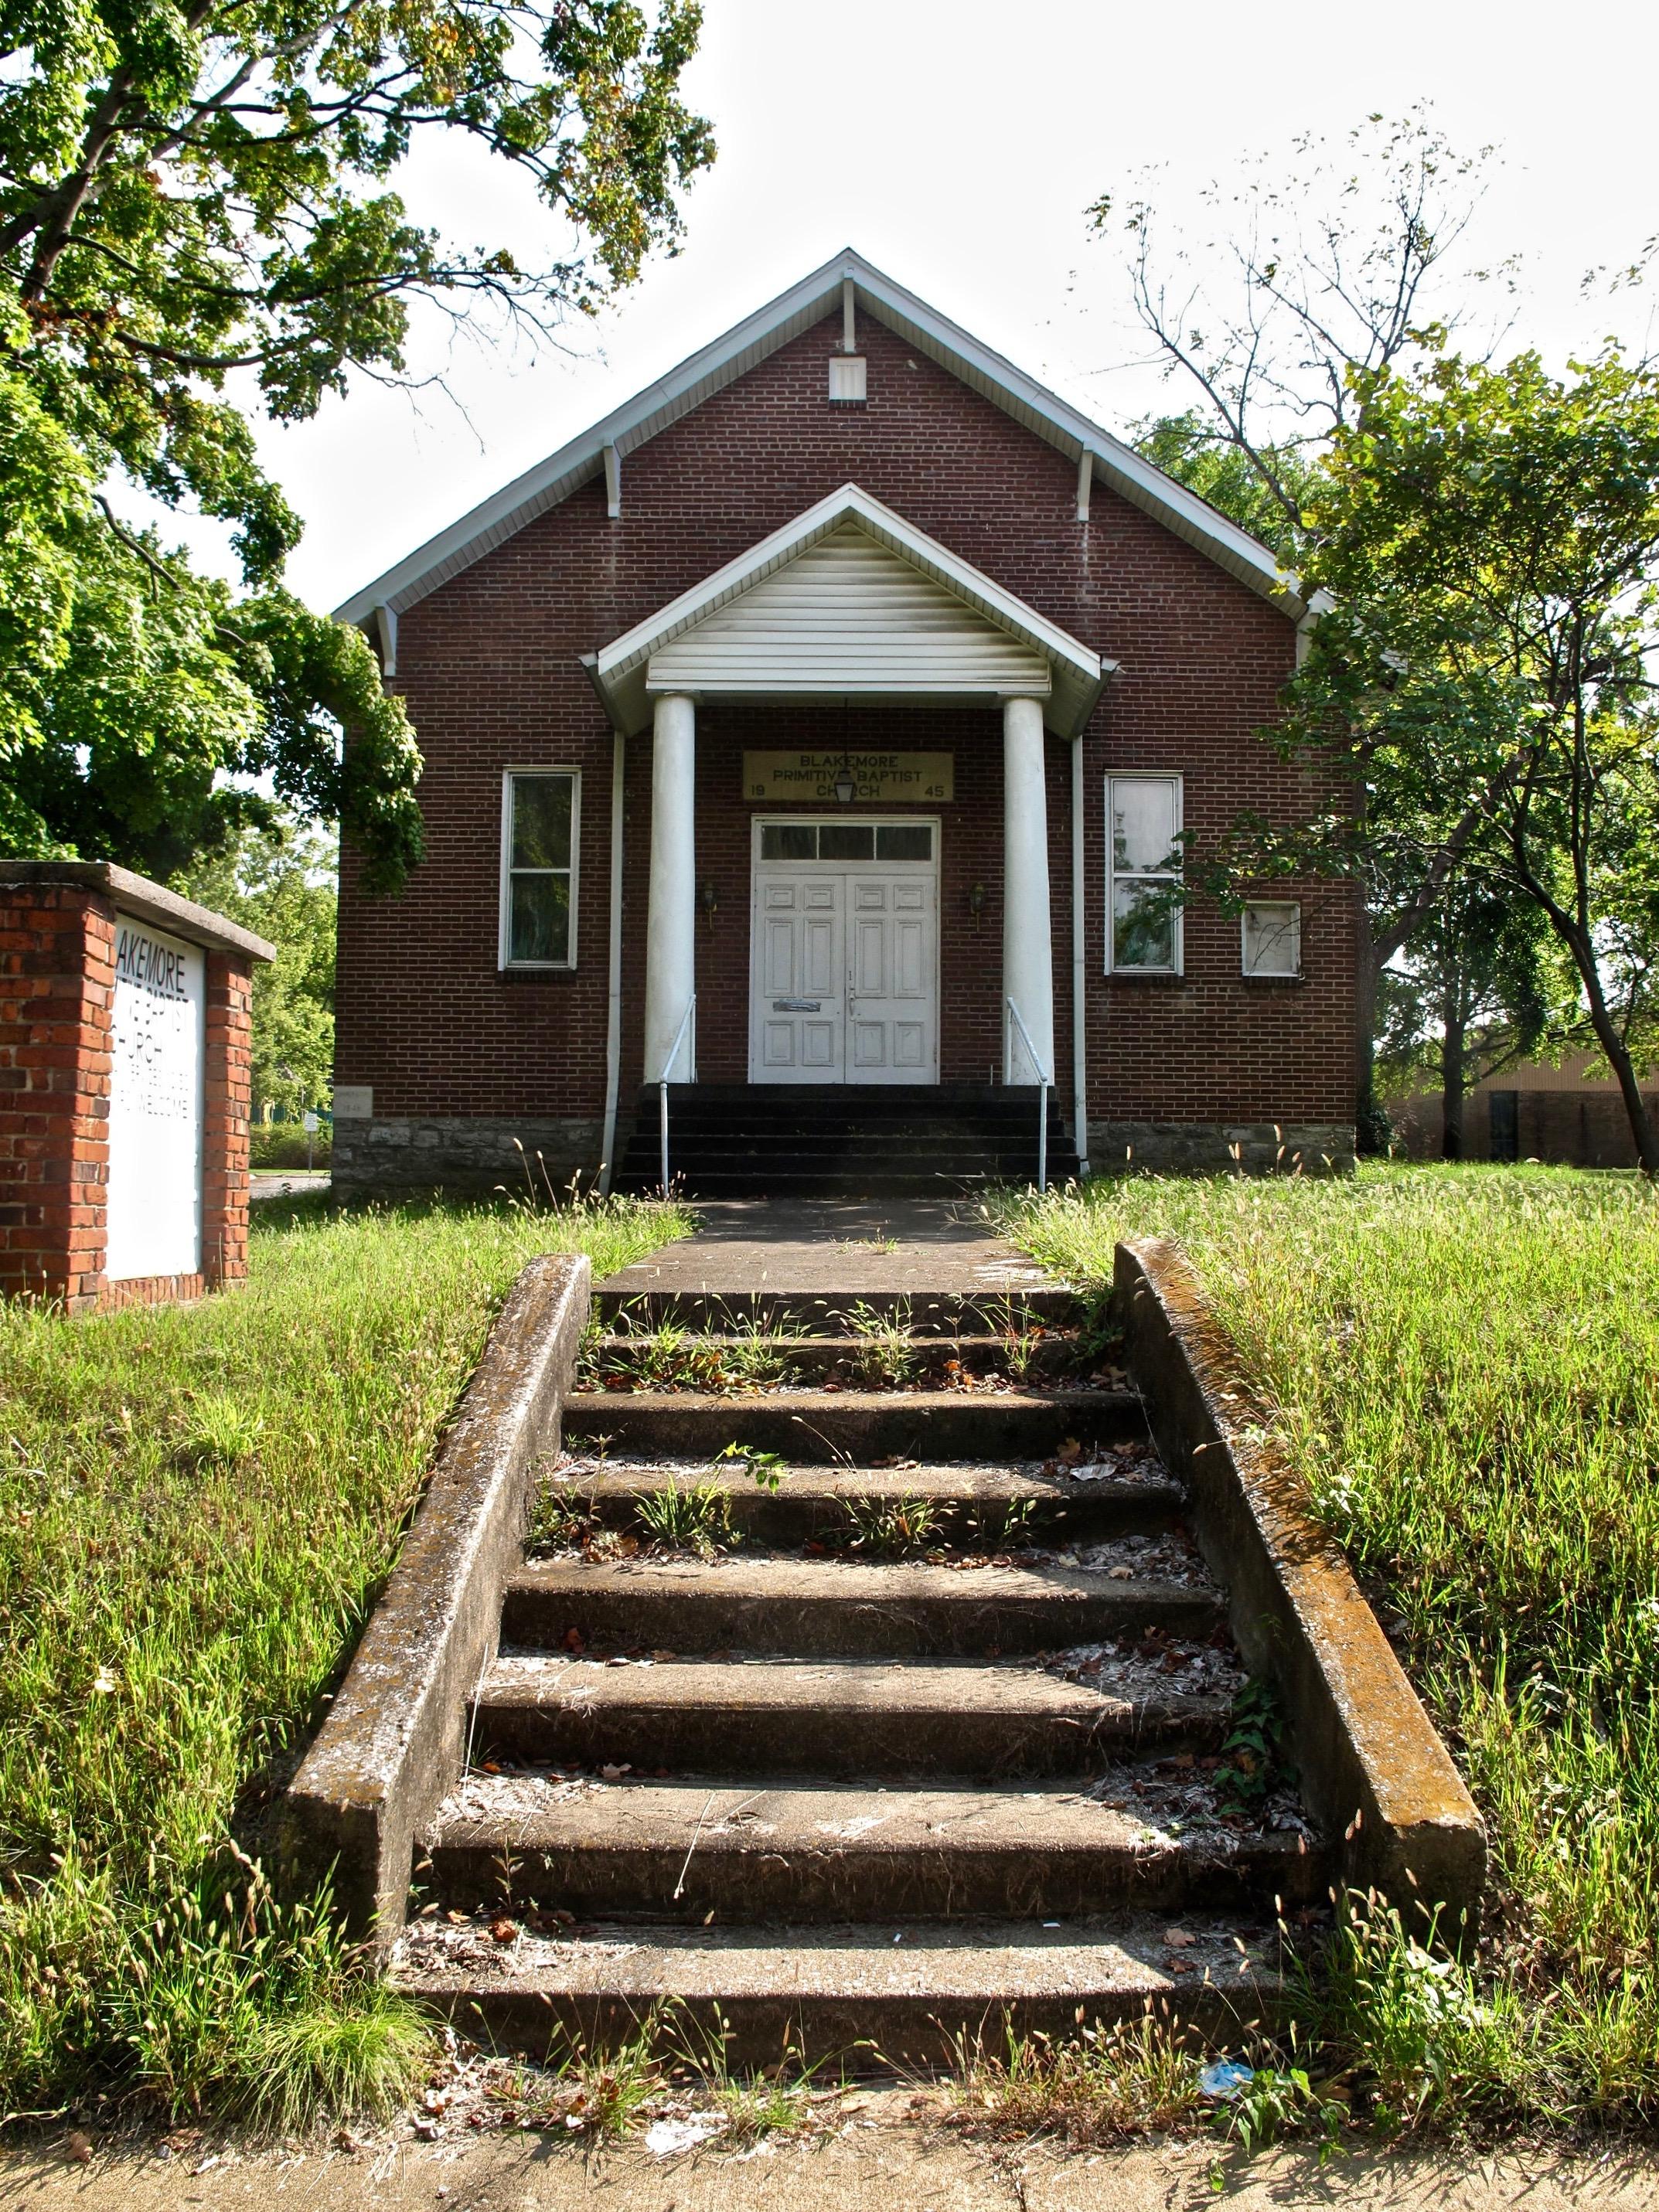 Blakemore Primitive Baptist Church, Ruby's predecessor